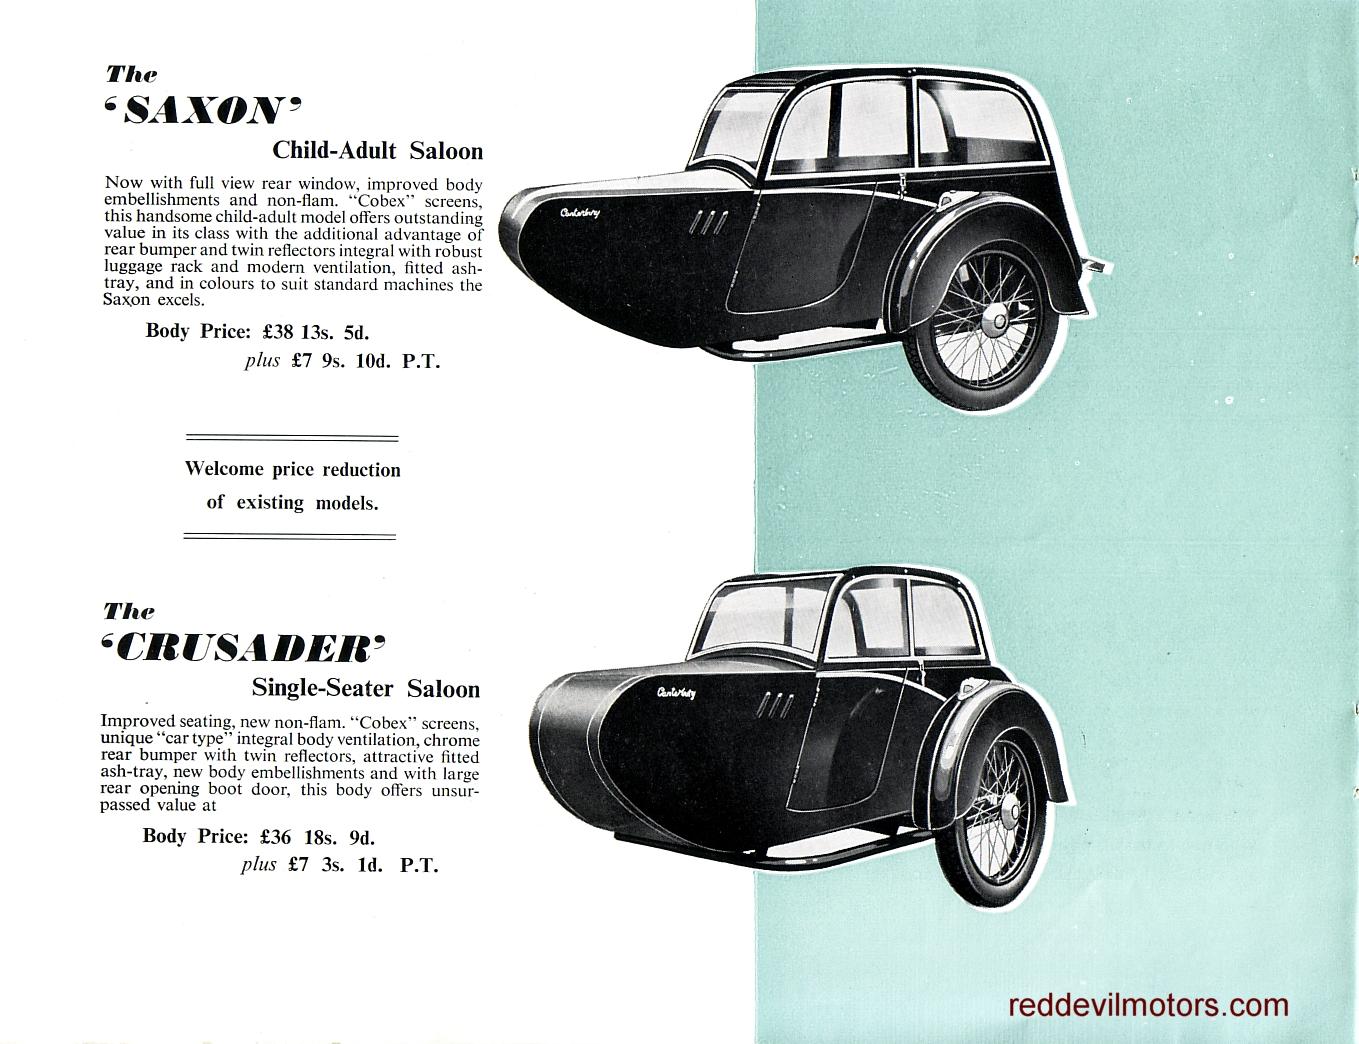 Red Devil Motors: Canterbury Sidecars 1957